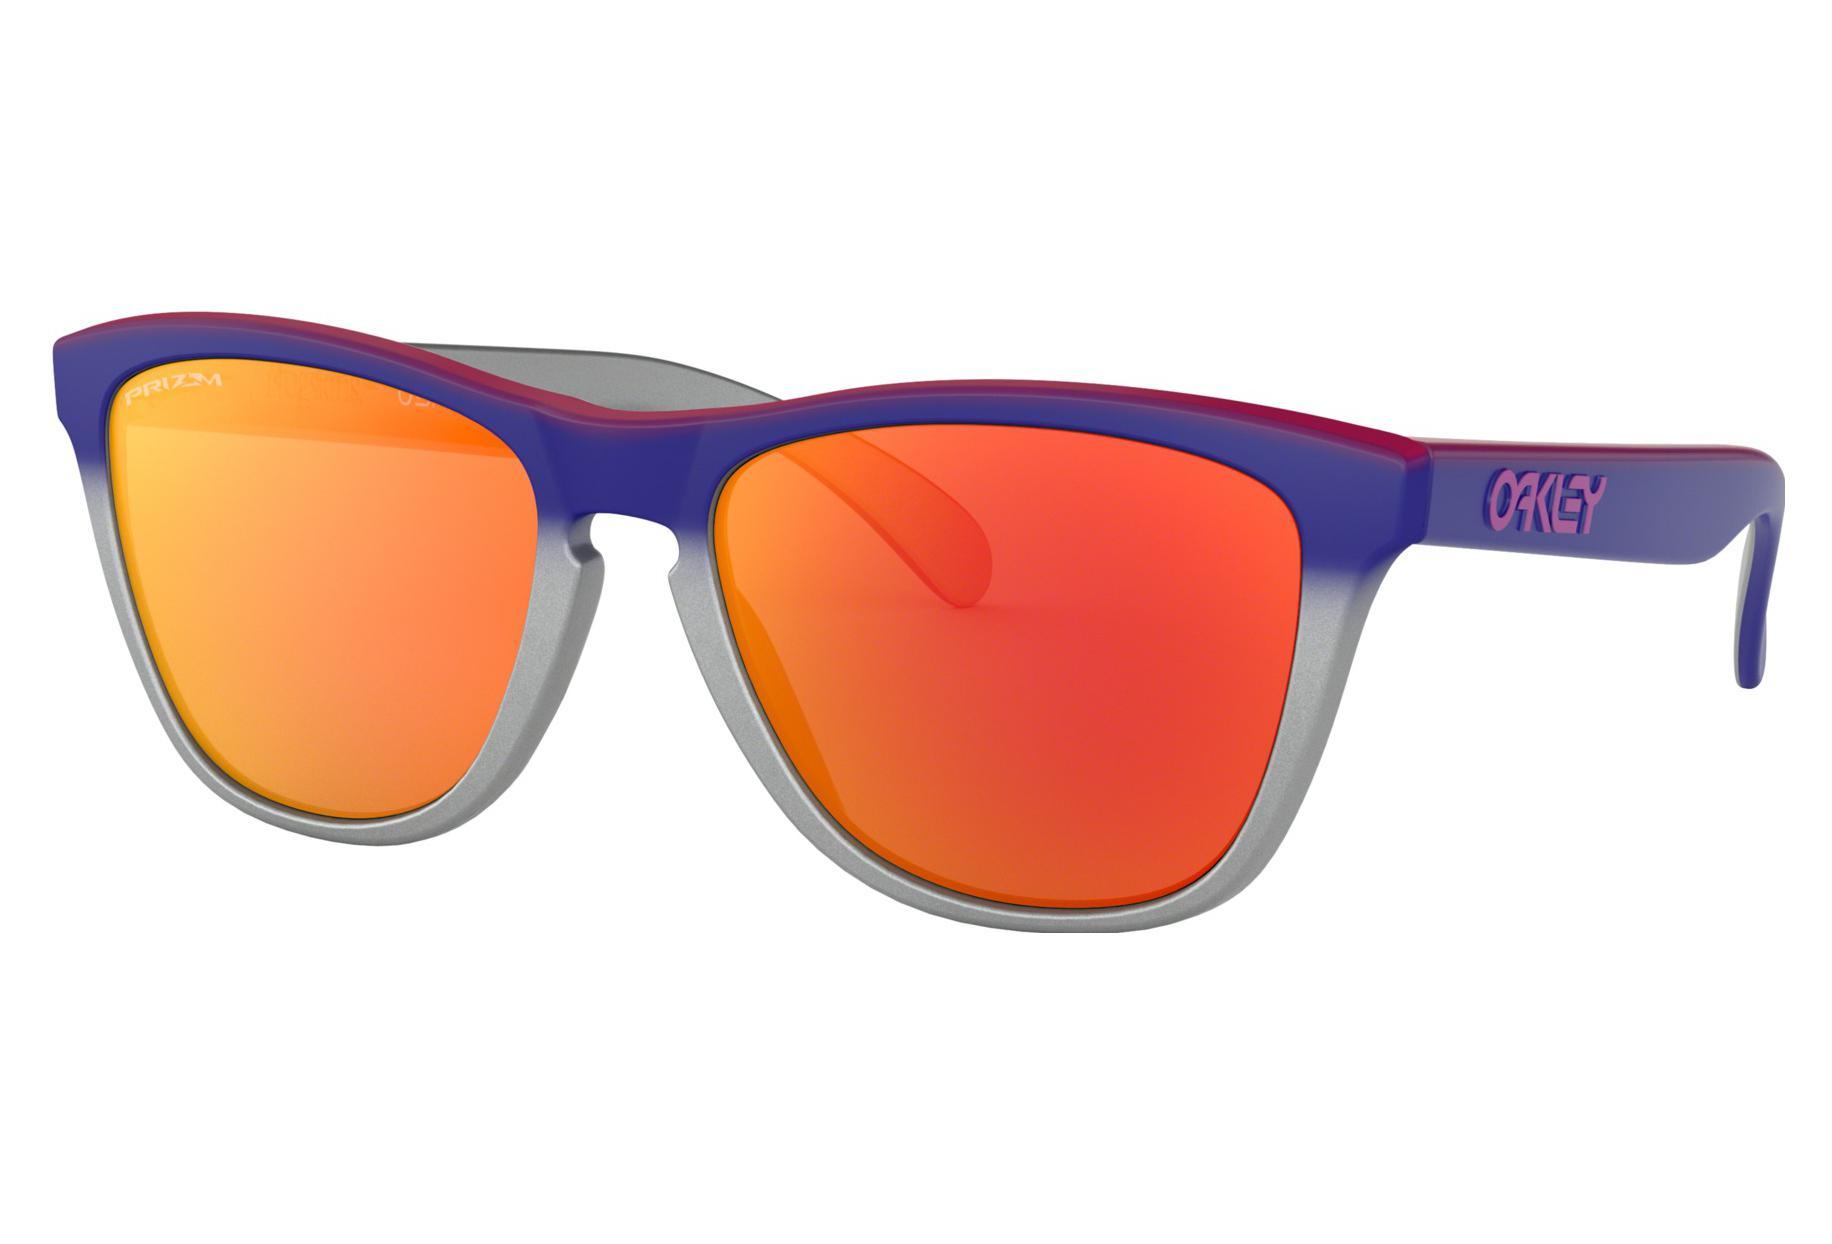 0bf098e371 Oakley Sunglasses Frogskins Splatterfade Collection / Black/Pink / Prizm  Ruby / Ref. OO9013-F155 | Alltricks.com